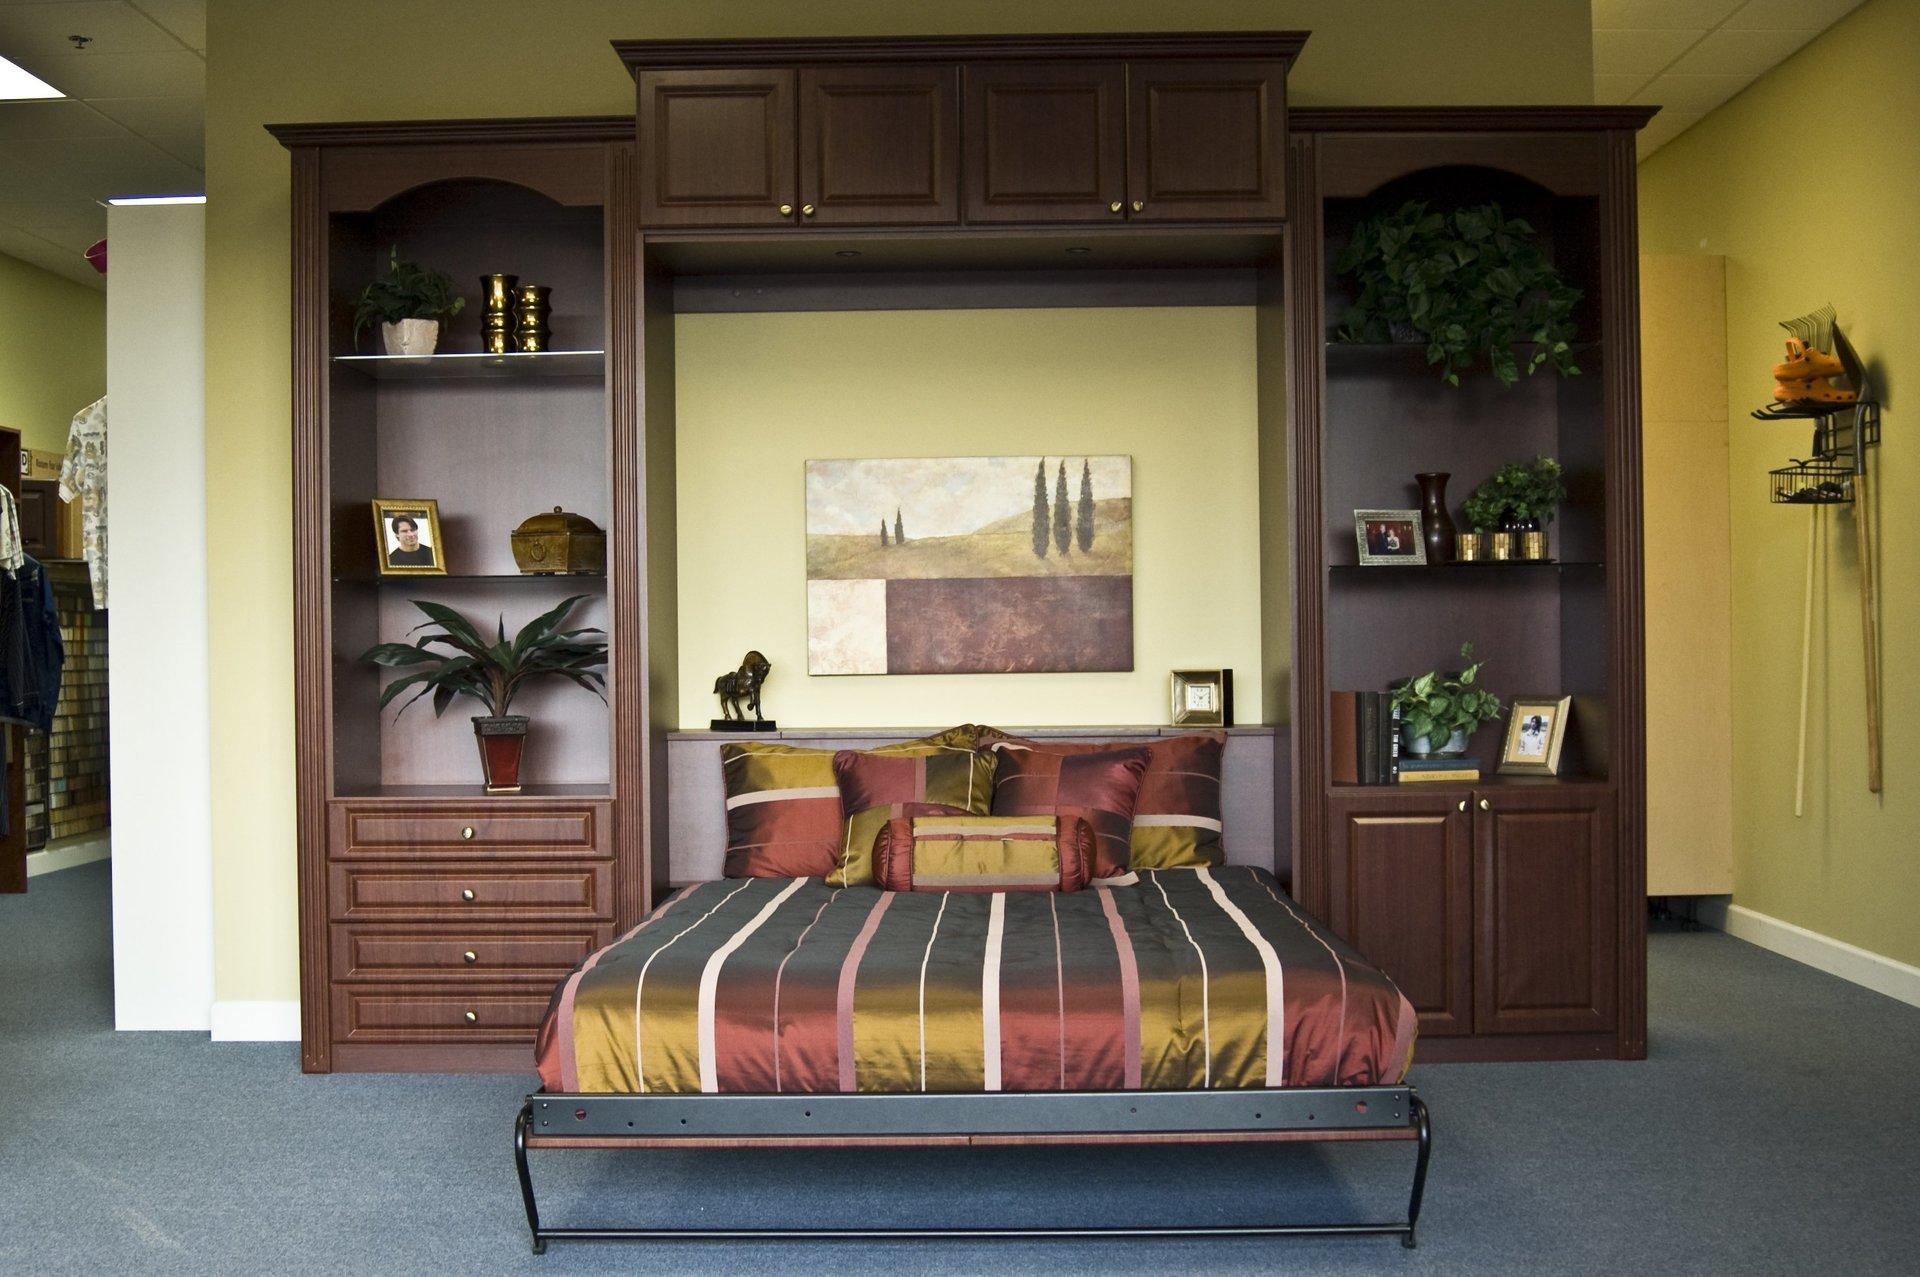 Wall Bed Designs. Wall Bed. View All Bed Designs